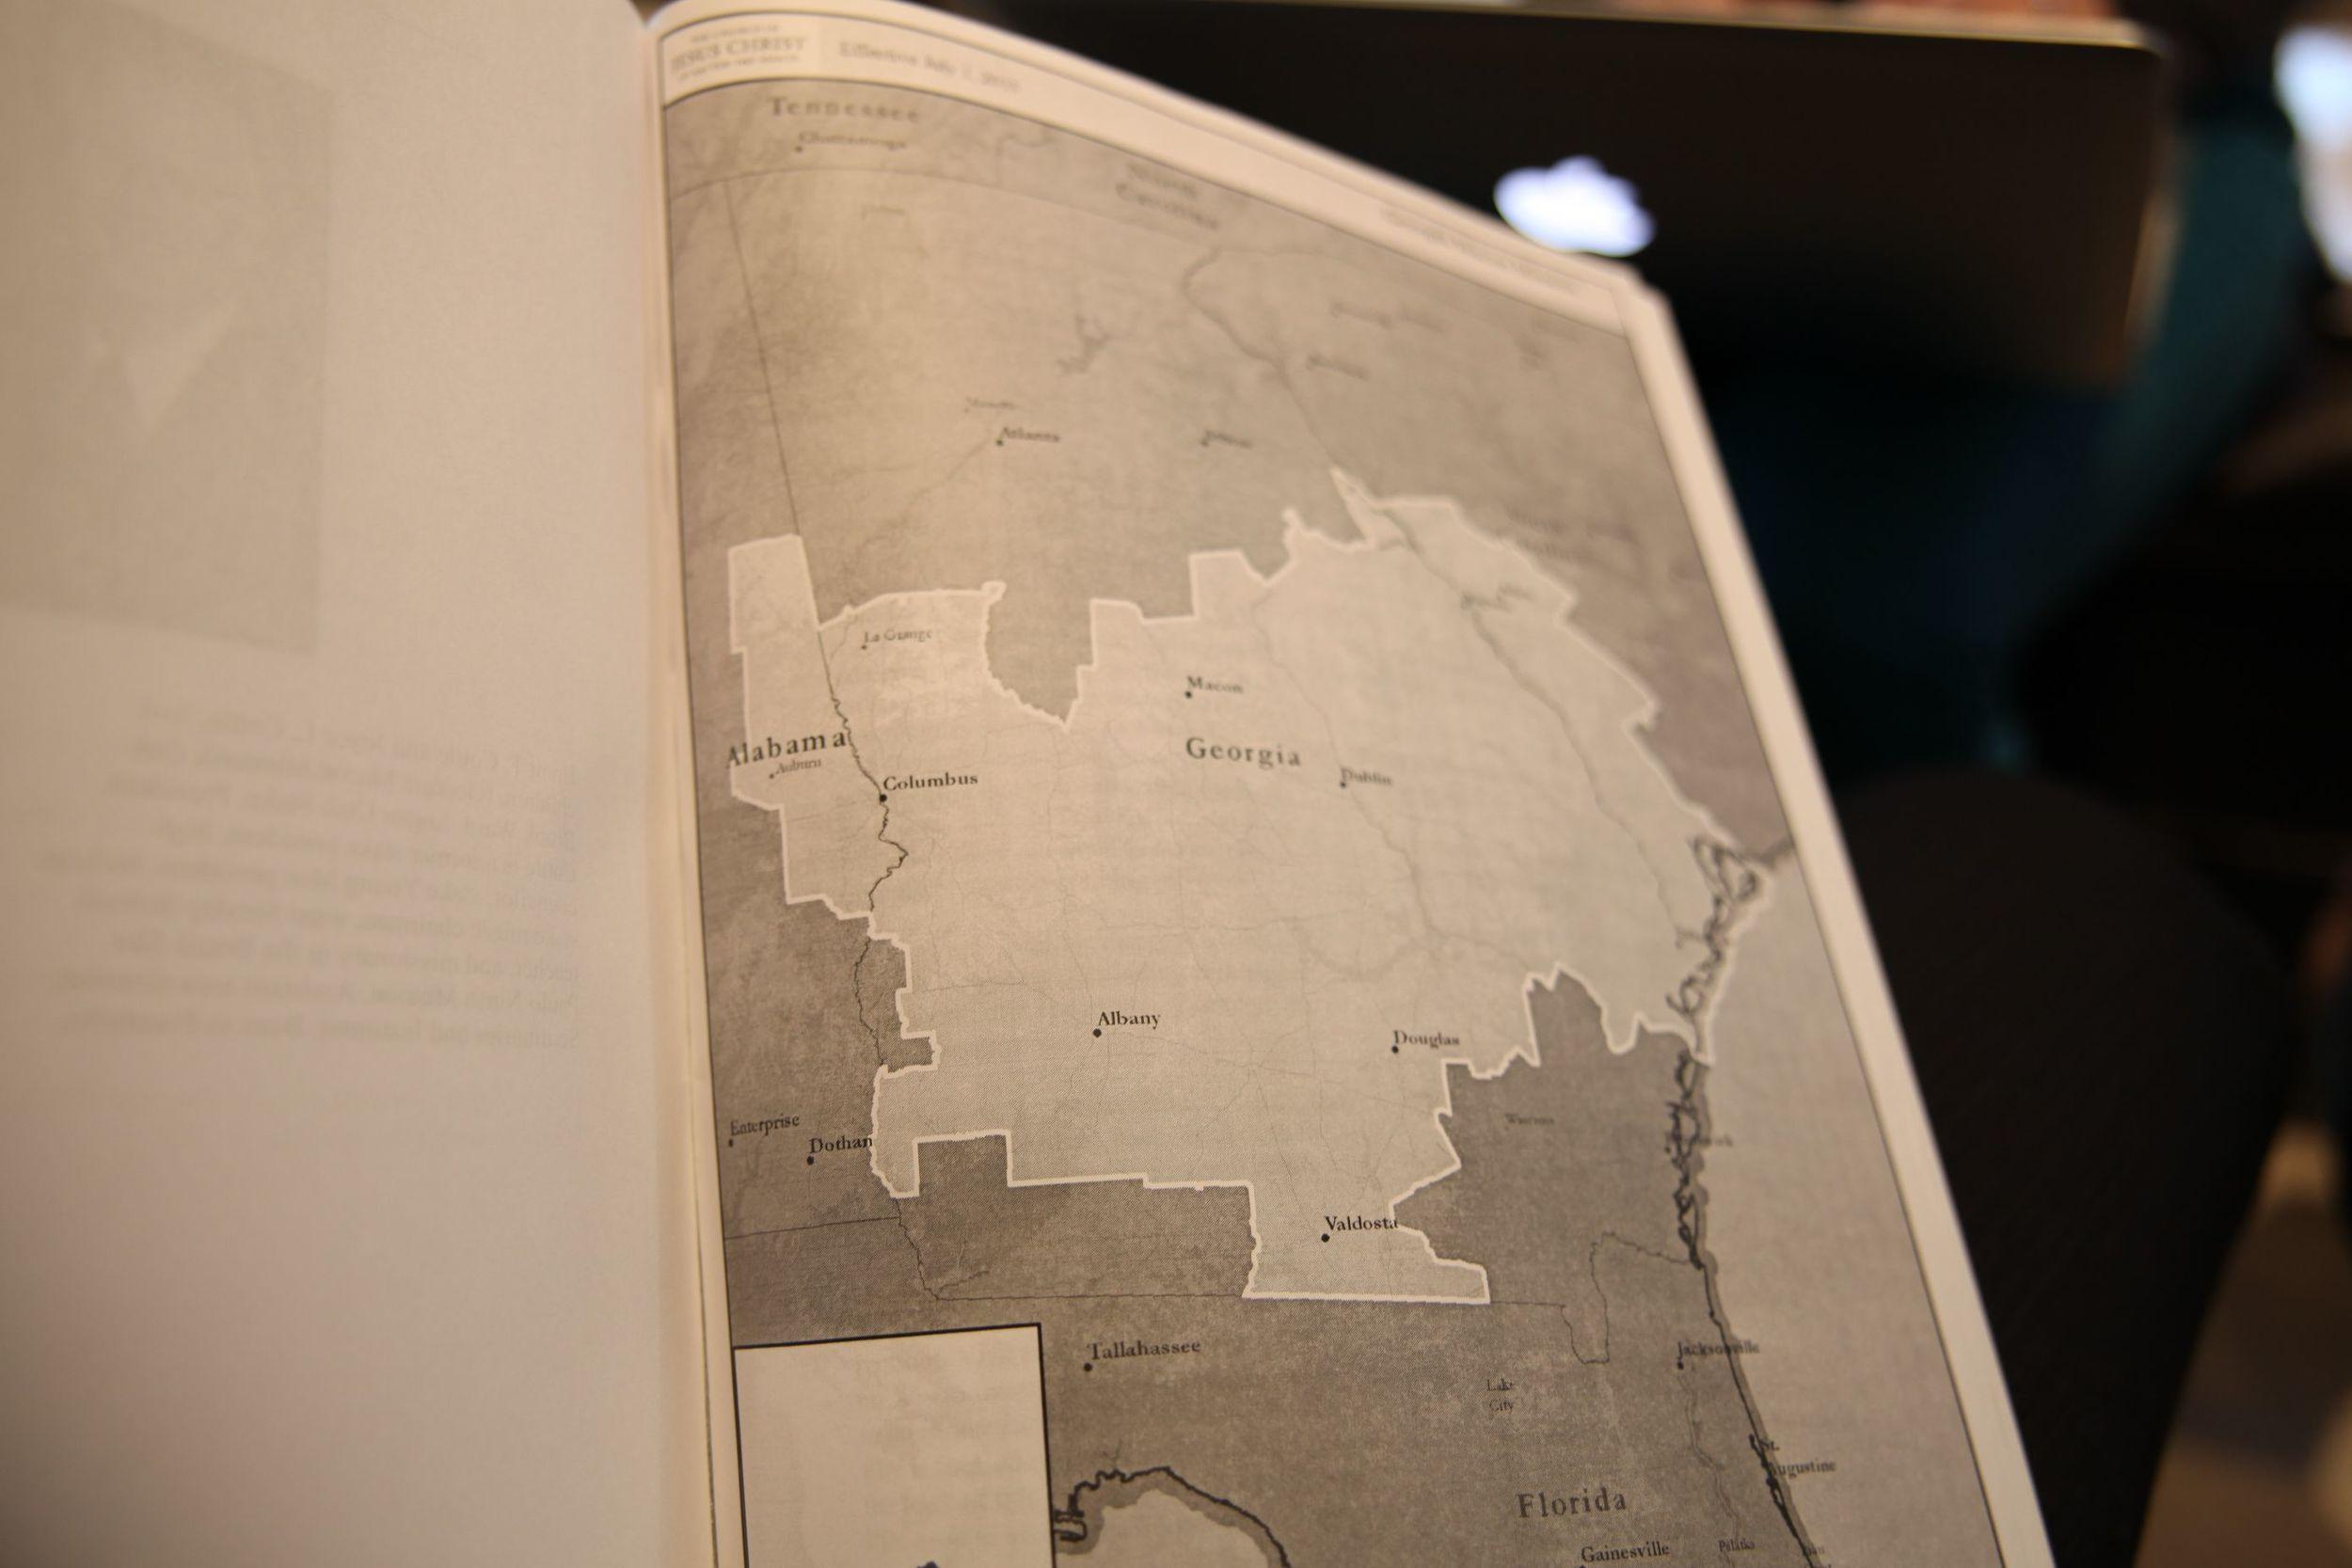 The mission includes parts of Georgia, Alabama, and South Carolina including Savannah, Hilton Head, Macon, and Auburn